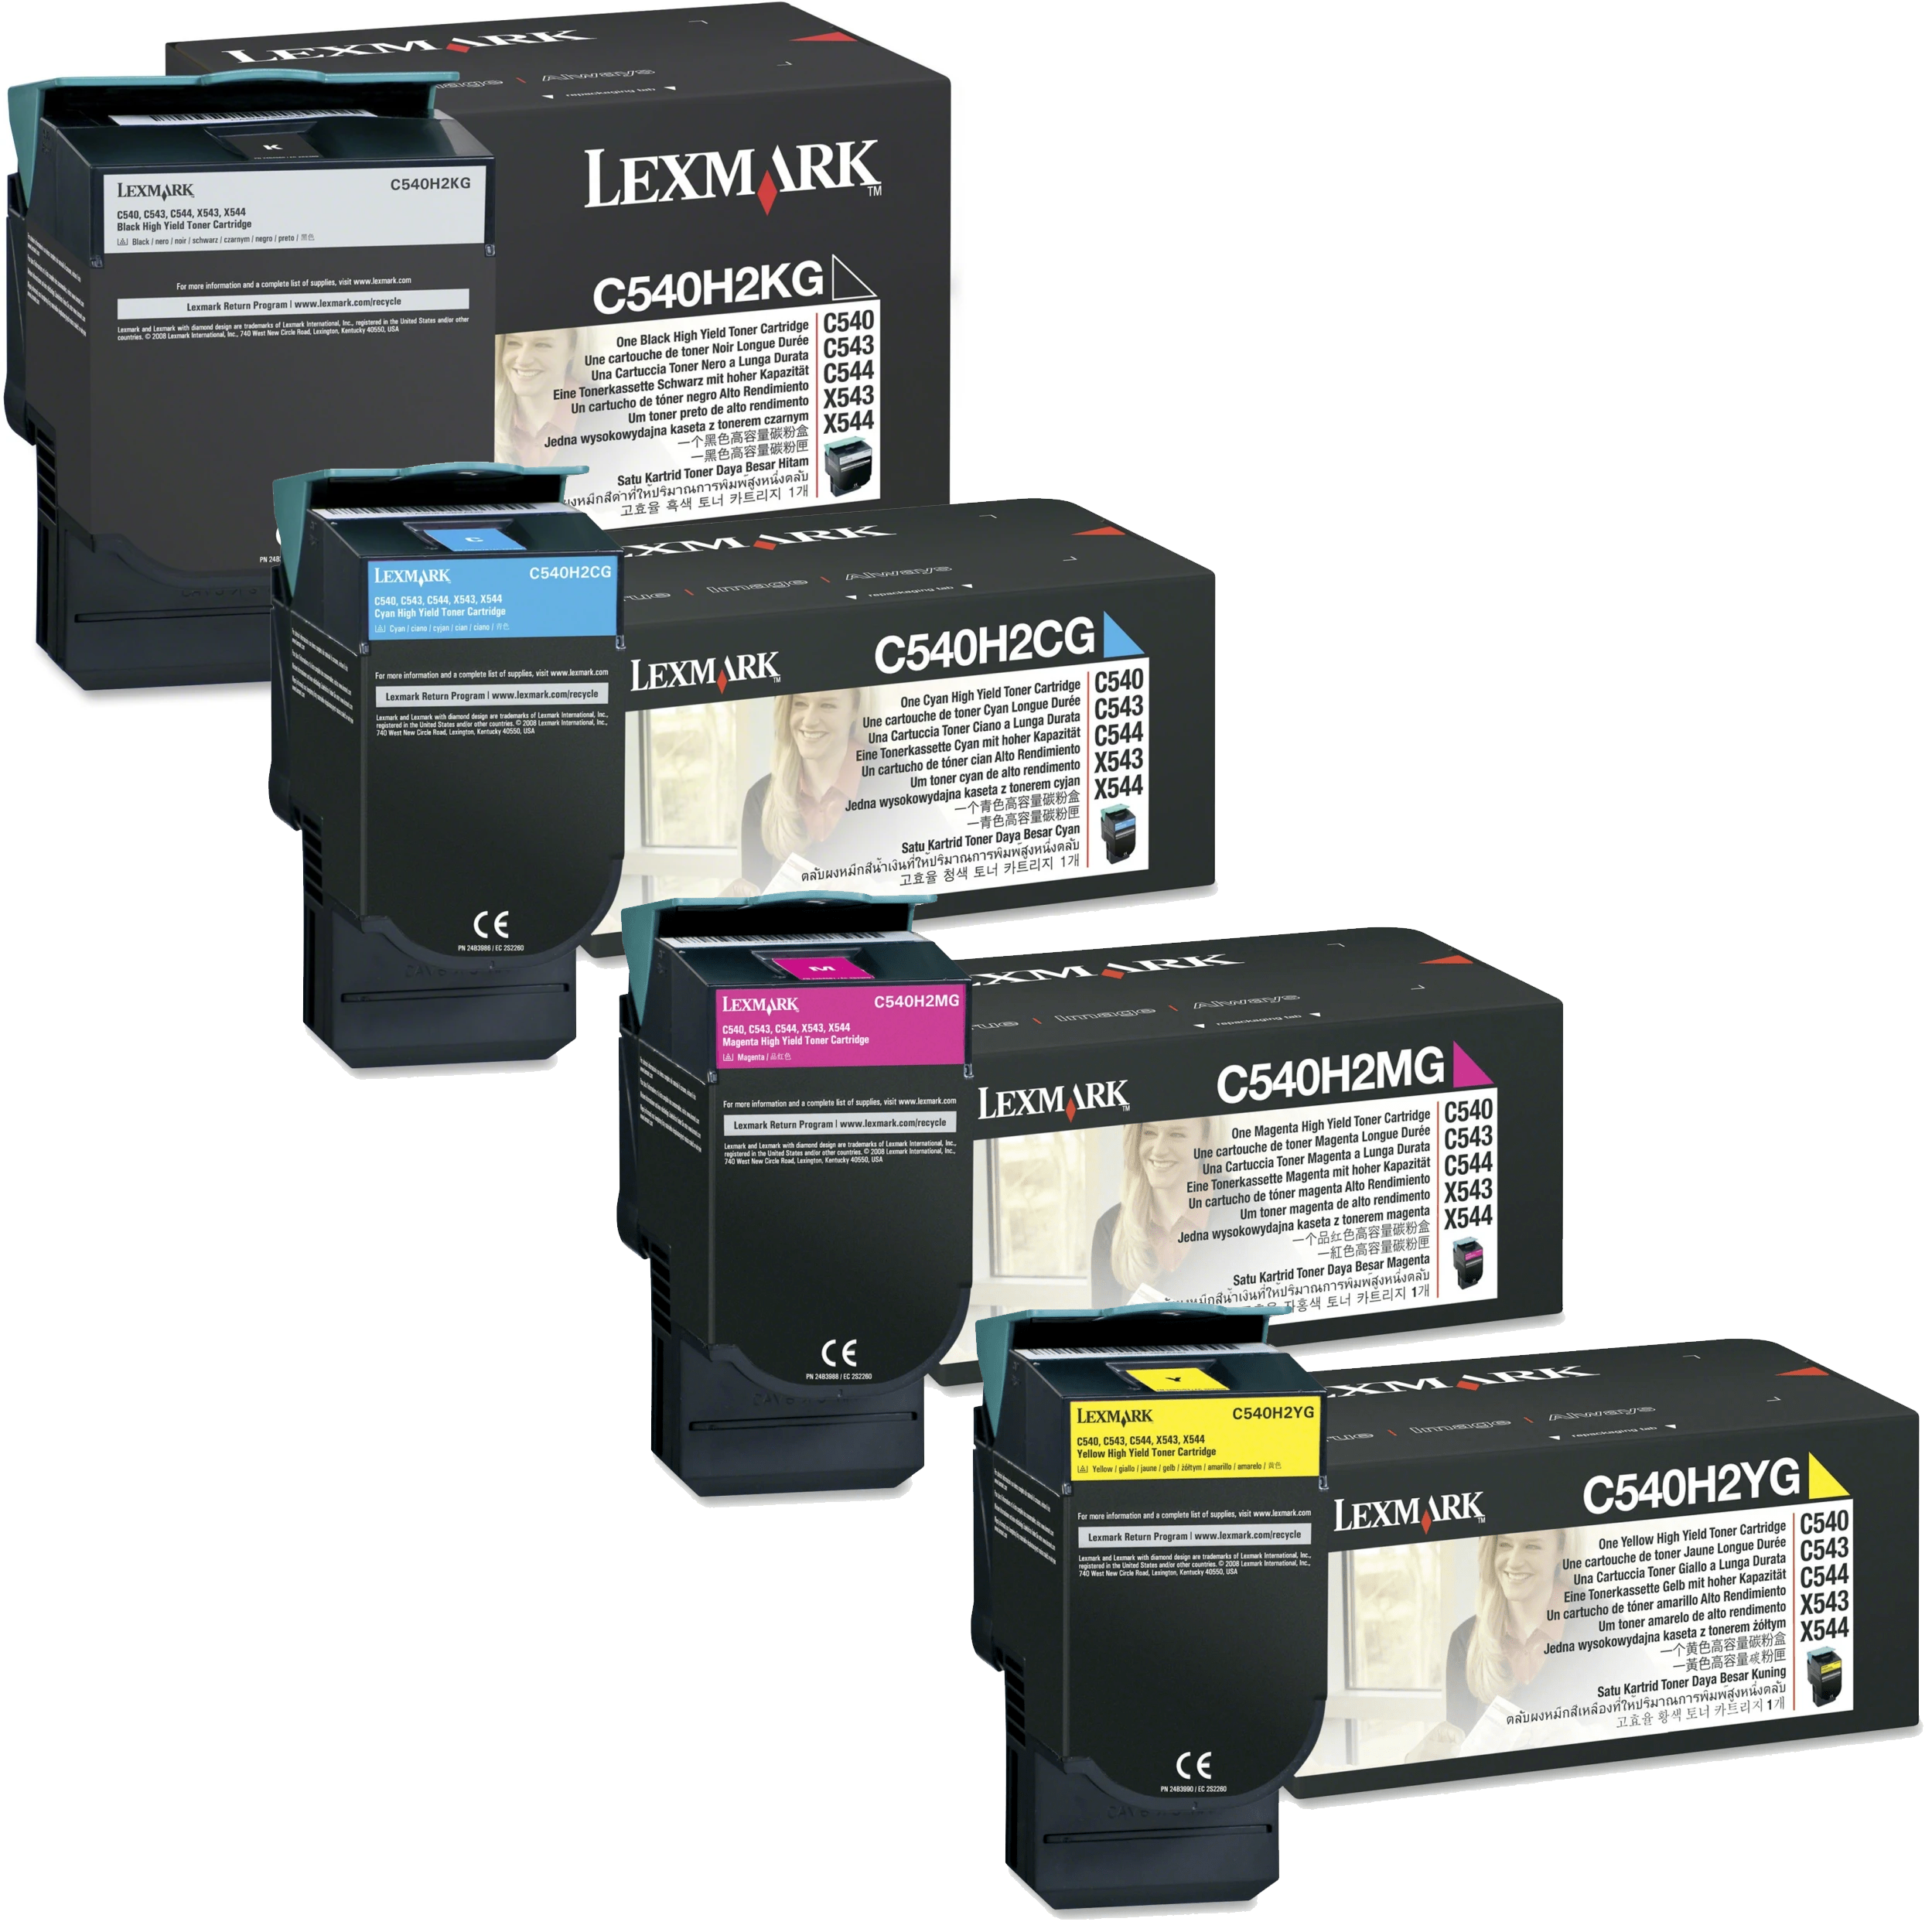 Lexmark C540H2 Set | C540H2CG C540H2KG C540H2MG C540H2YG | Original Lexmark High-Yield Toner Cartridges – Black, Cyan, Magenta, Yellow